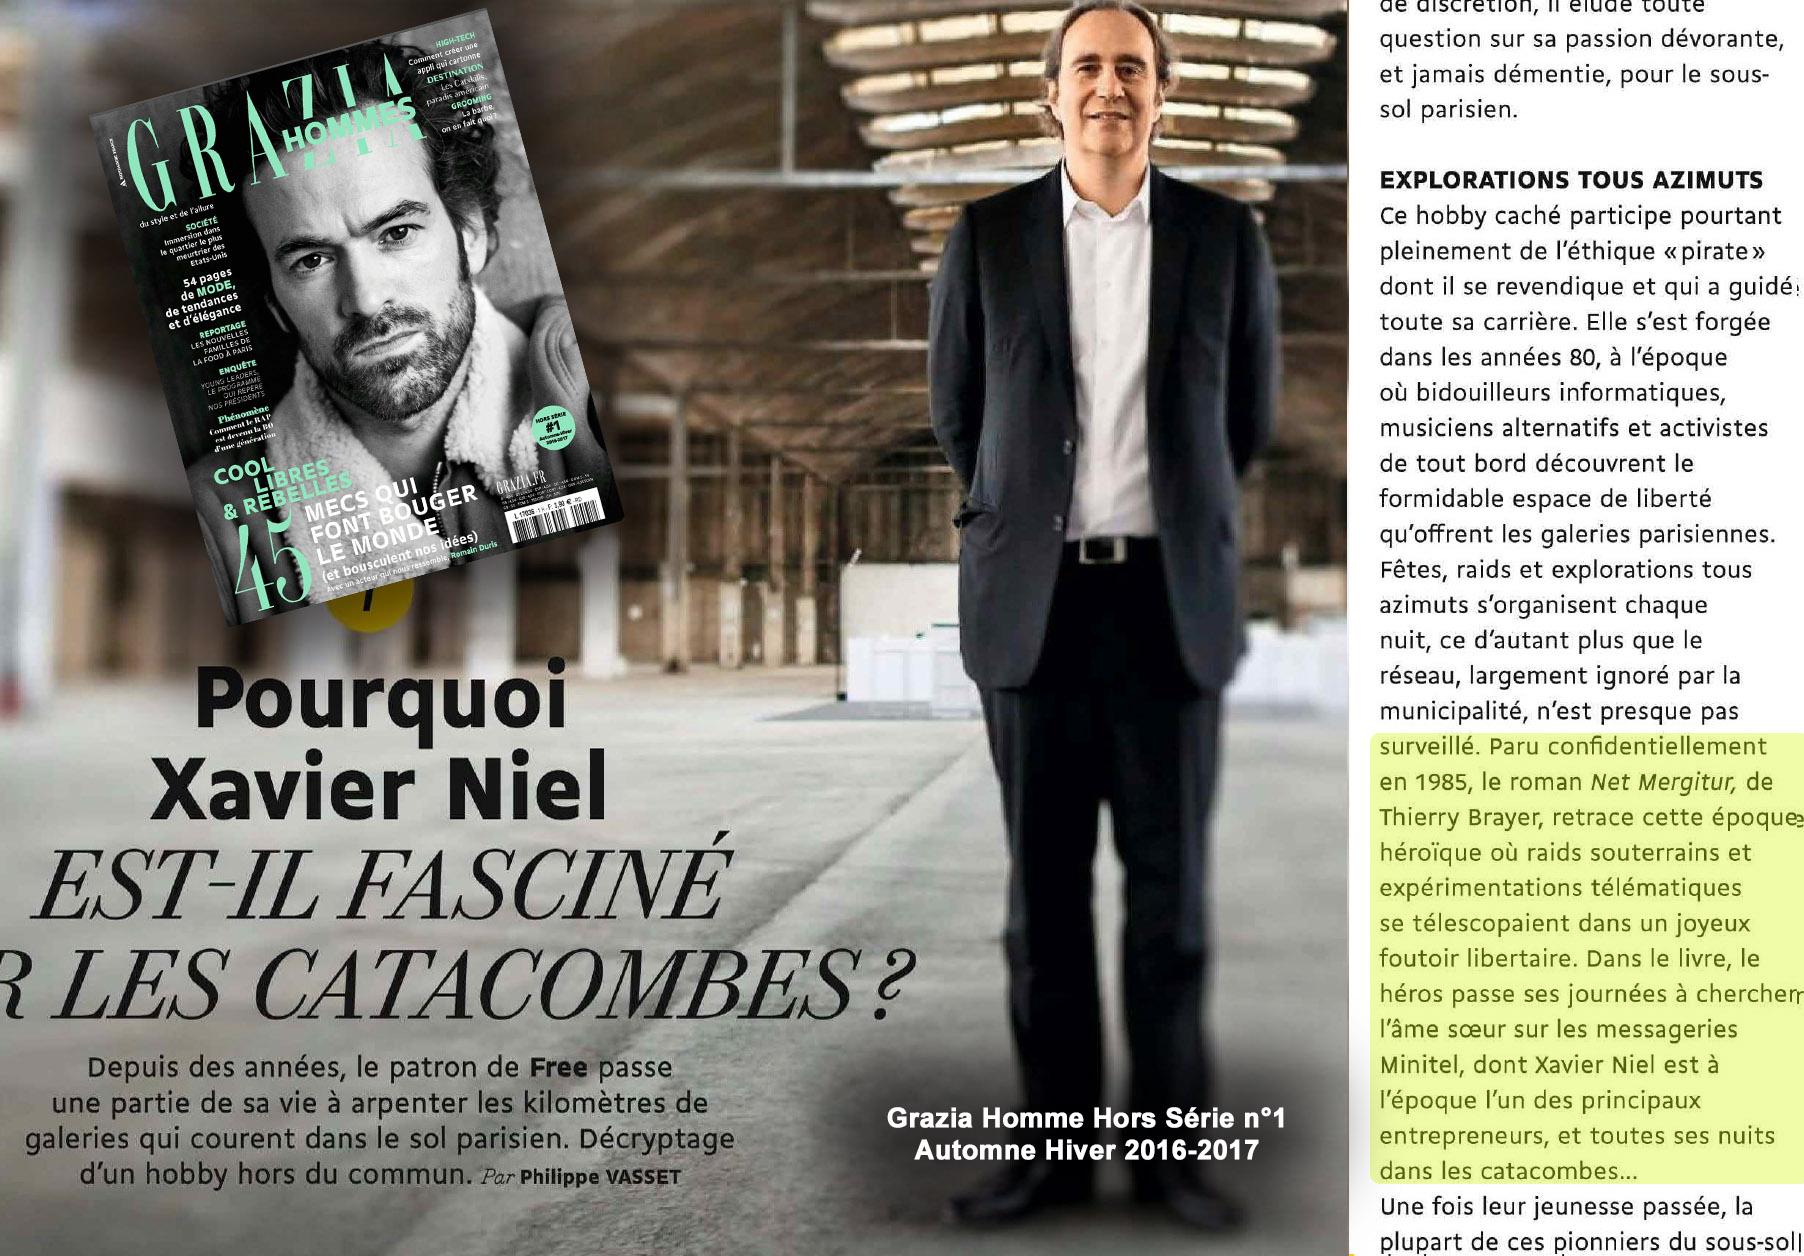 thierry-brayer-avec-xavier-niel-dans-grazia-homme-hors-serie-no-1-2016-2017